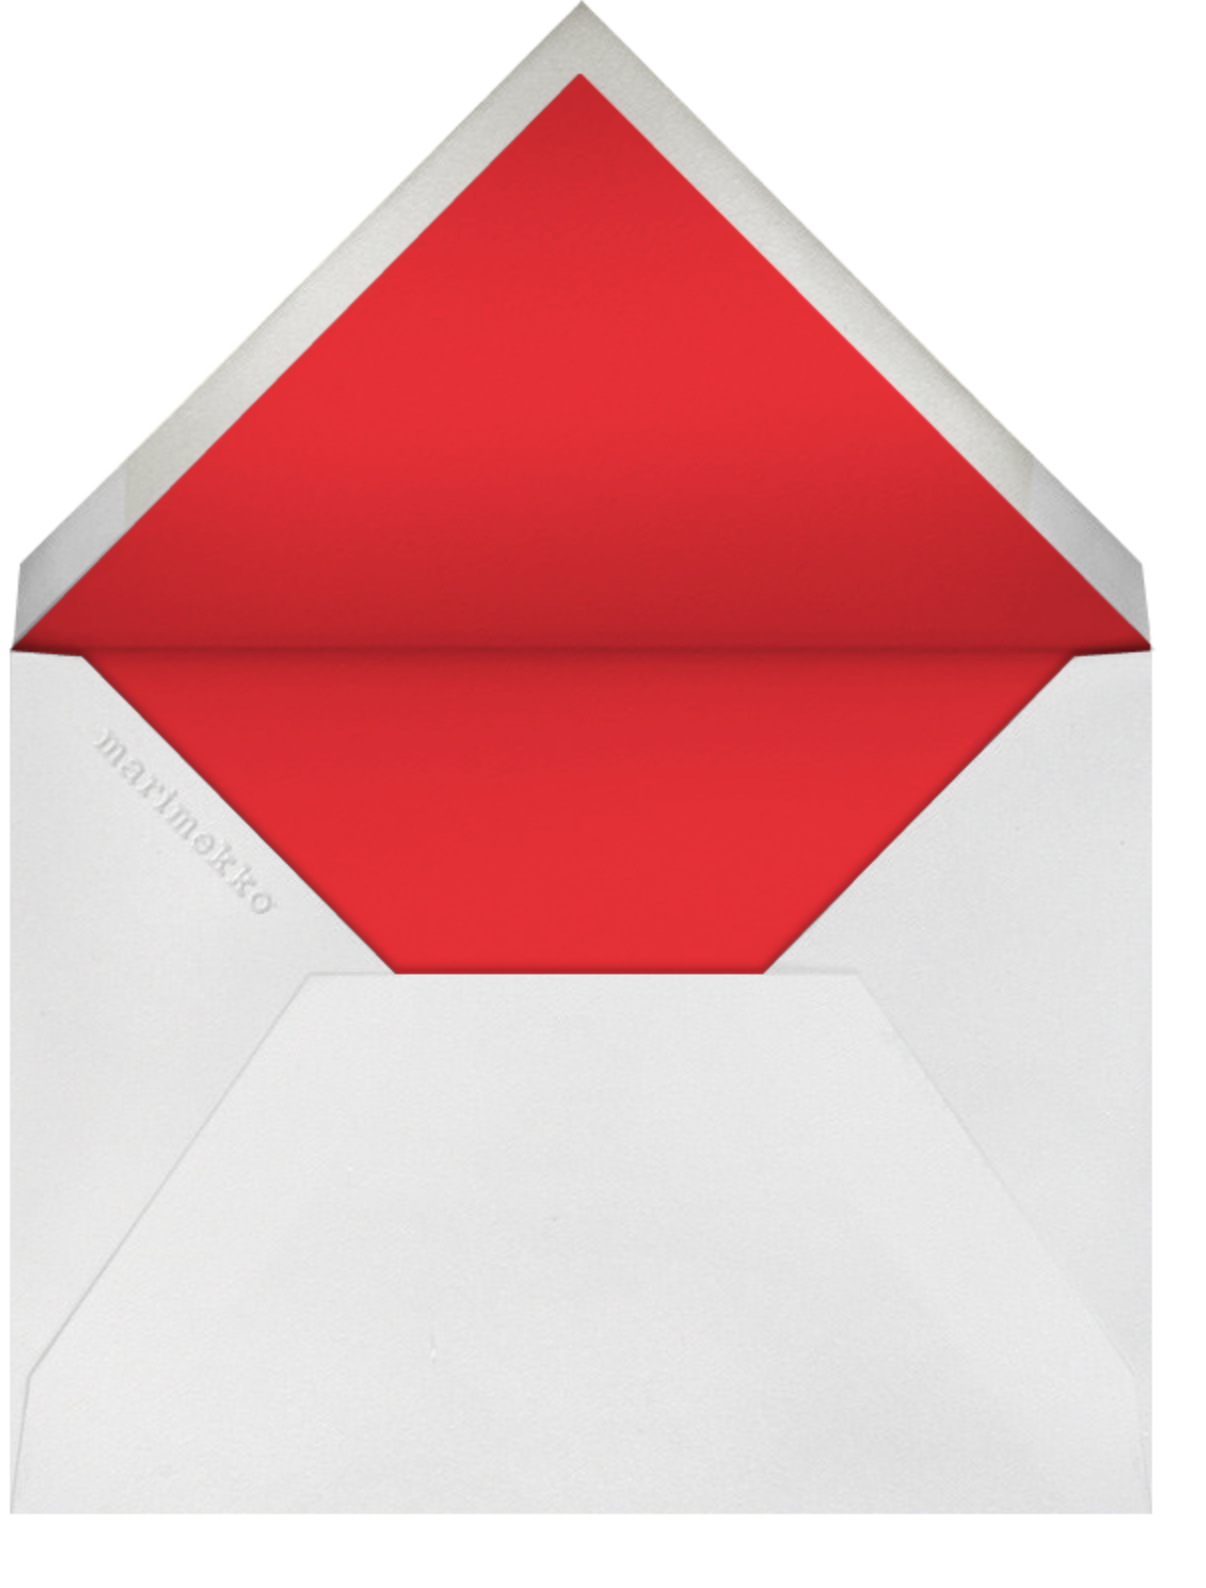 Raanu (Photo) - Marimekko - Christmas - envelope back